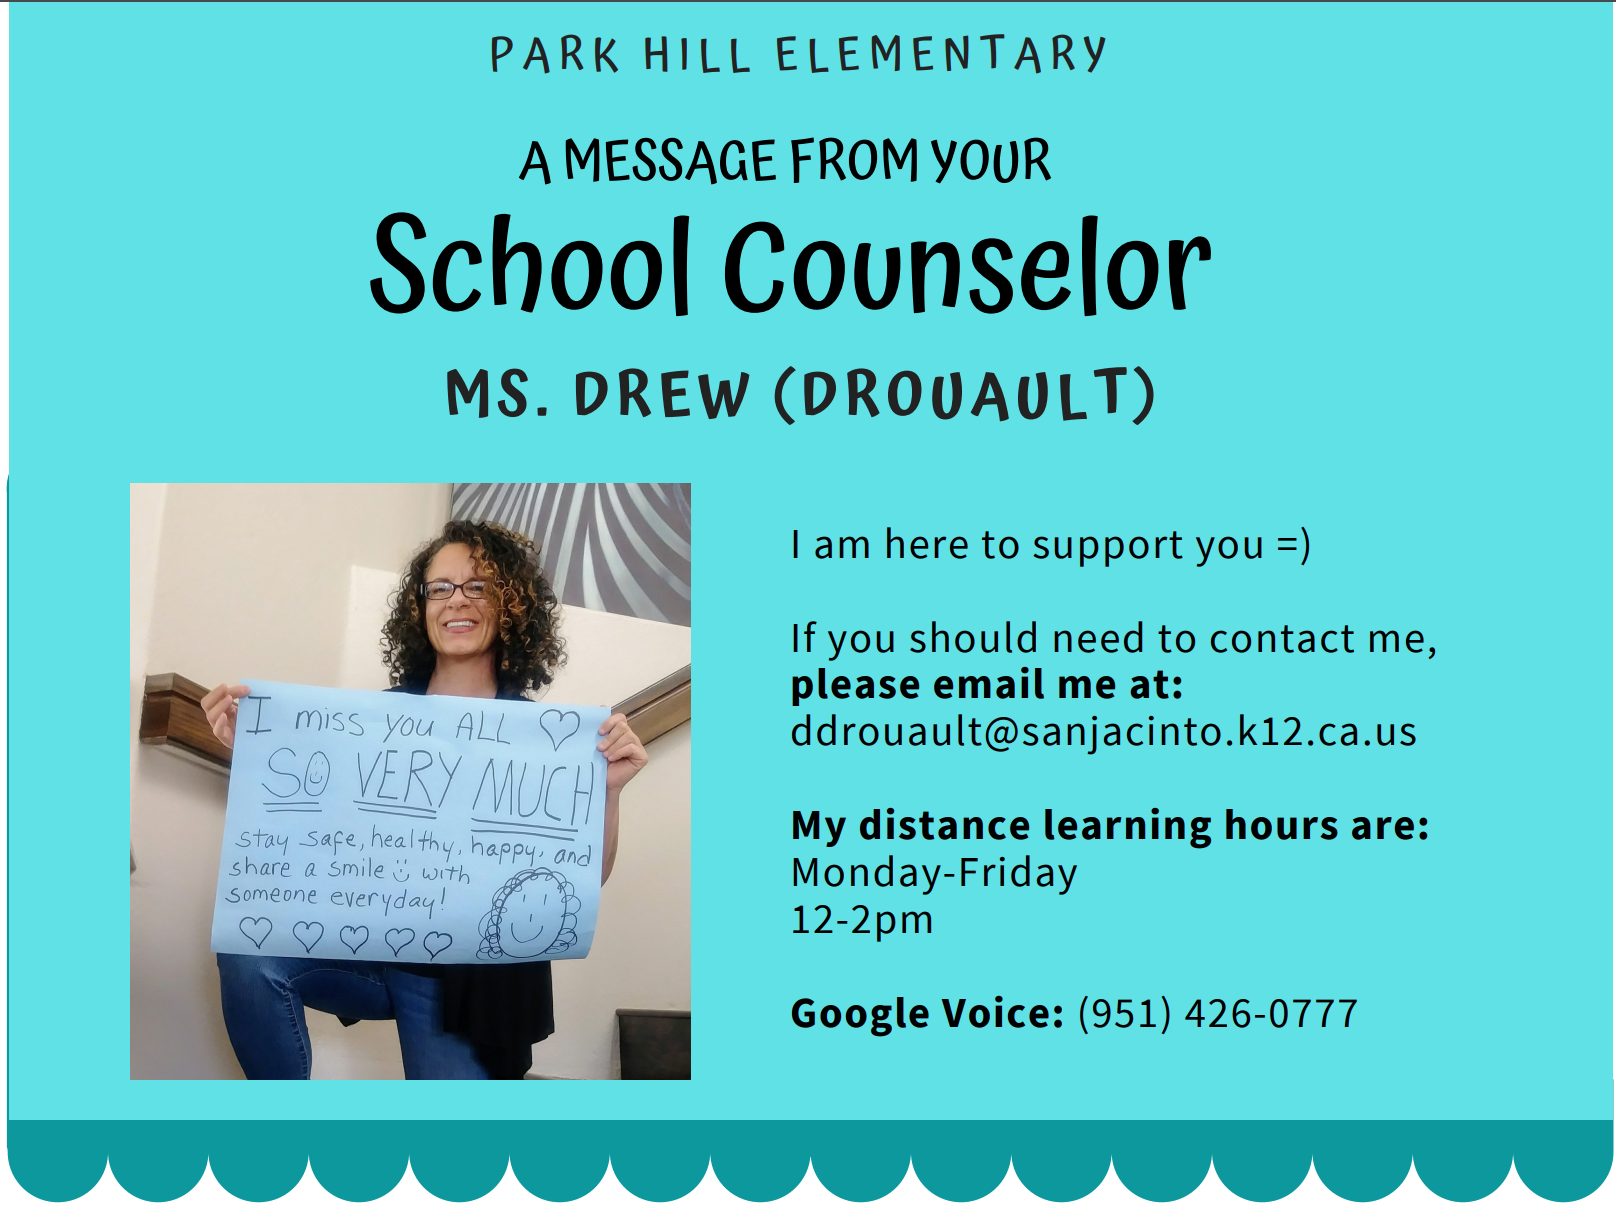 Mrs. Drew, School Counselor